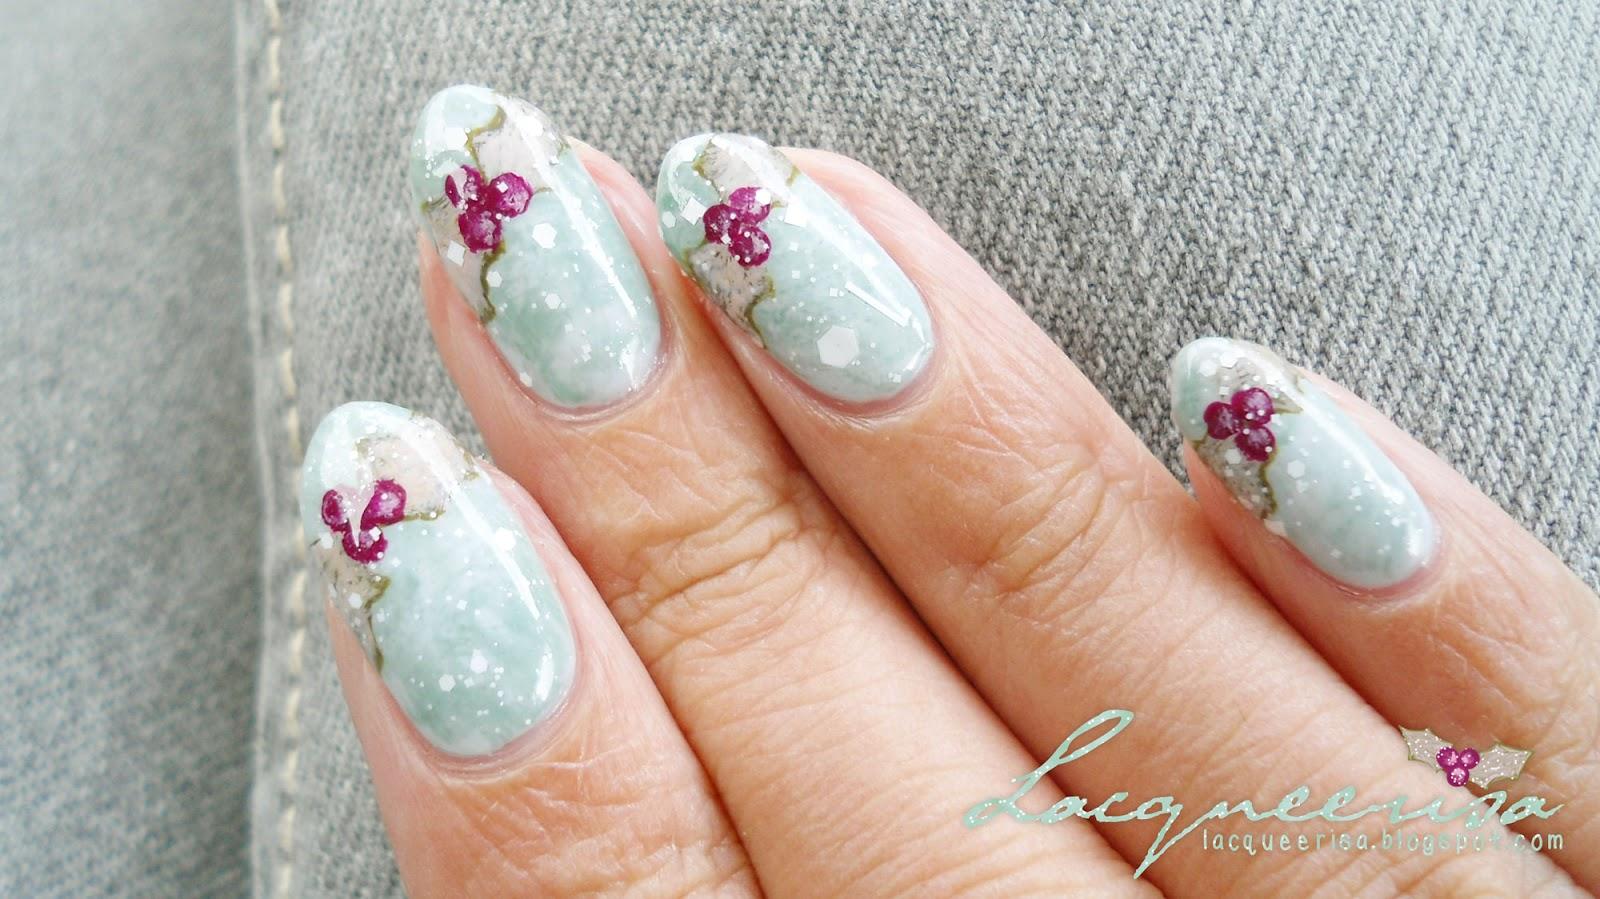 Almost White lacqueerisa.blogspot.com